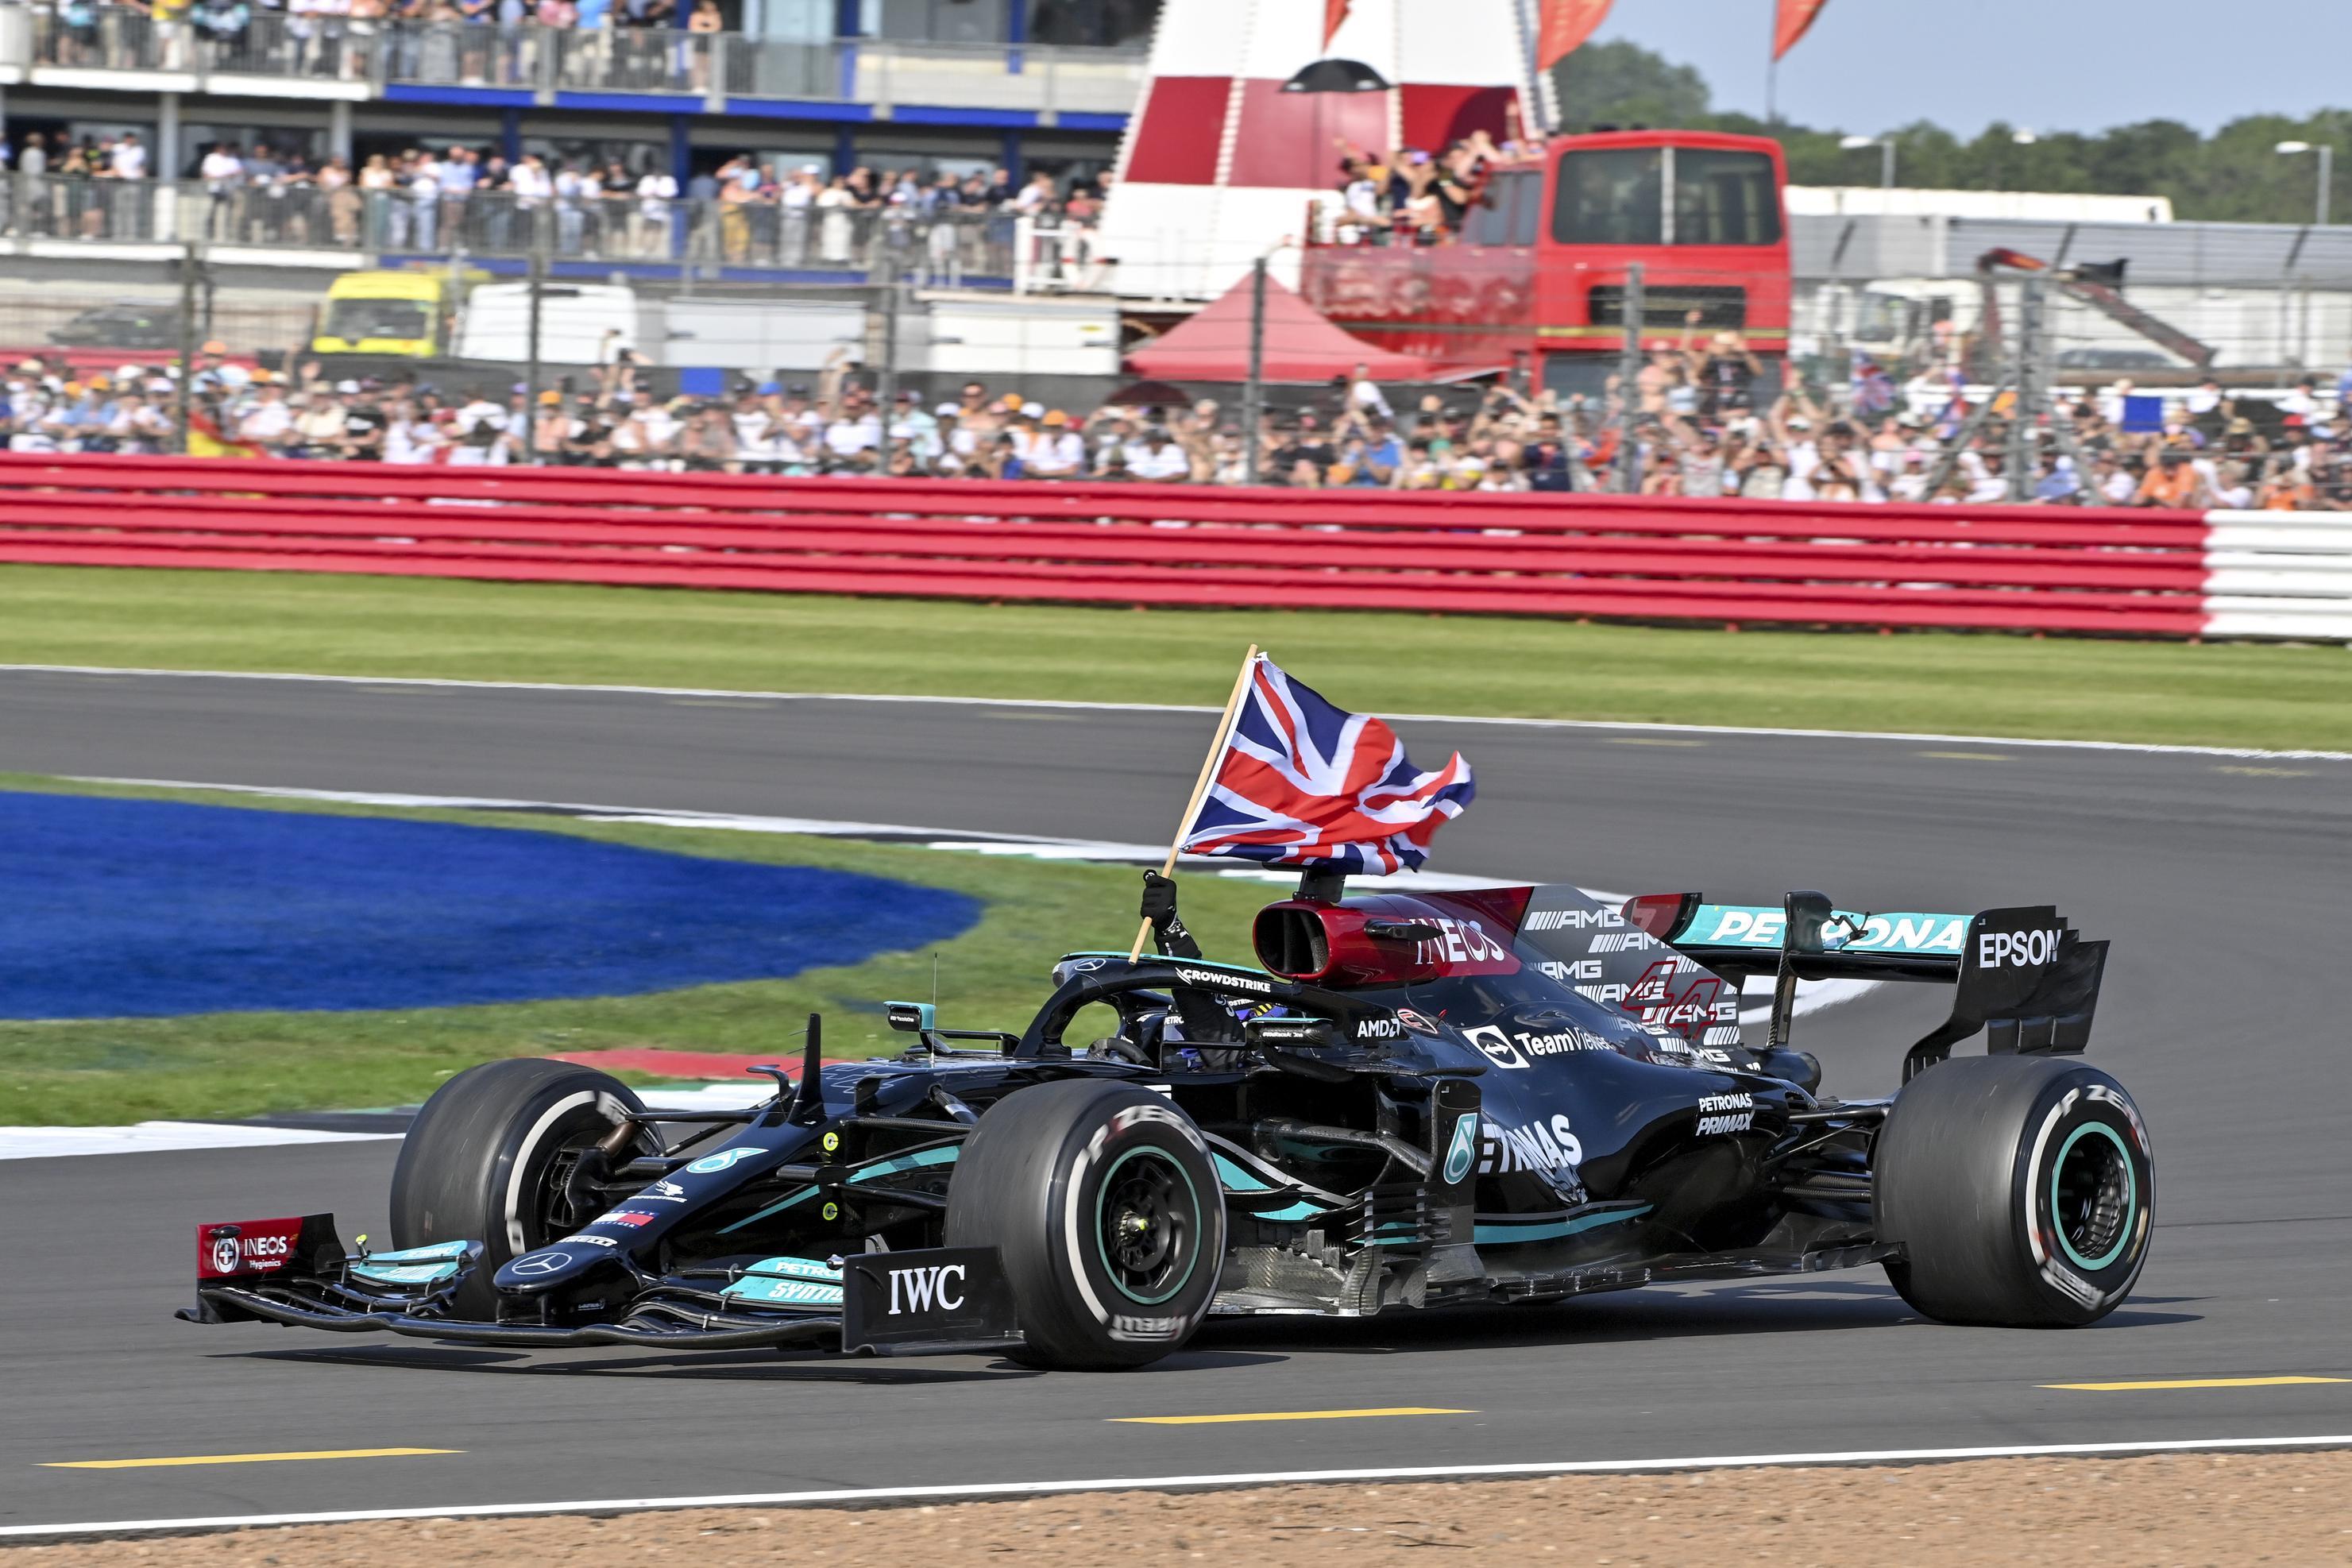 Mercedes-AMG Petronas Formula One Team / Silverstone GP 2021